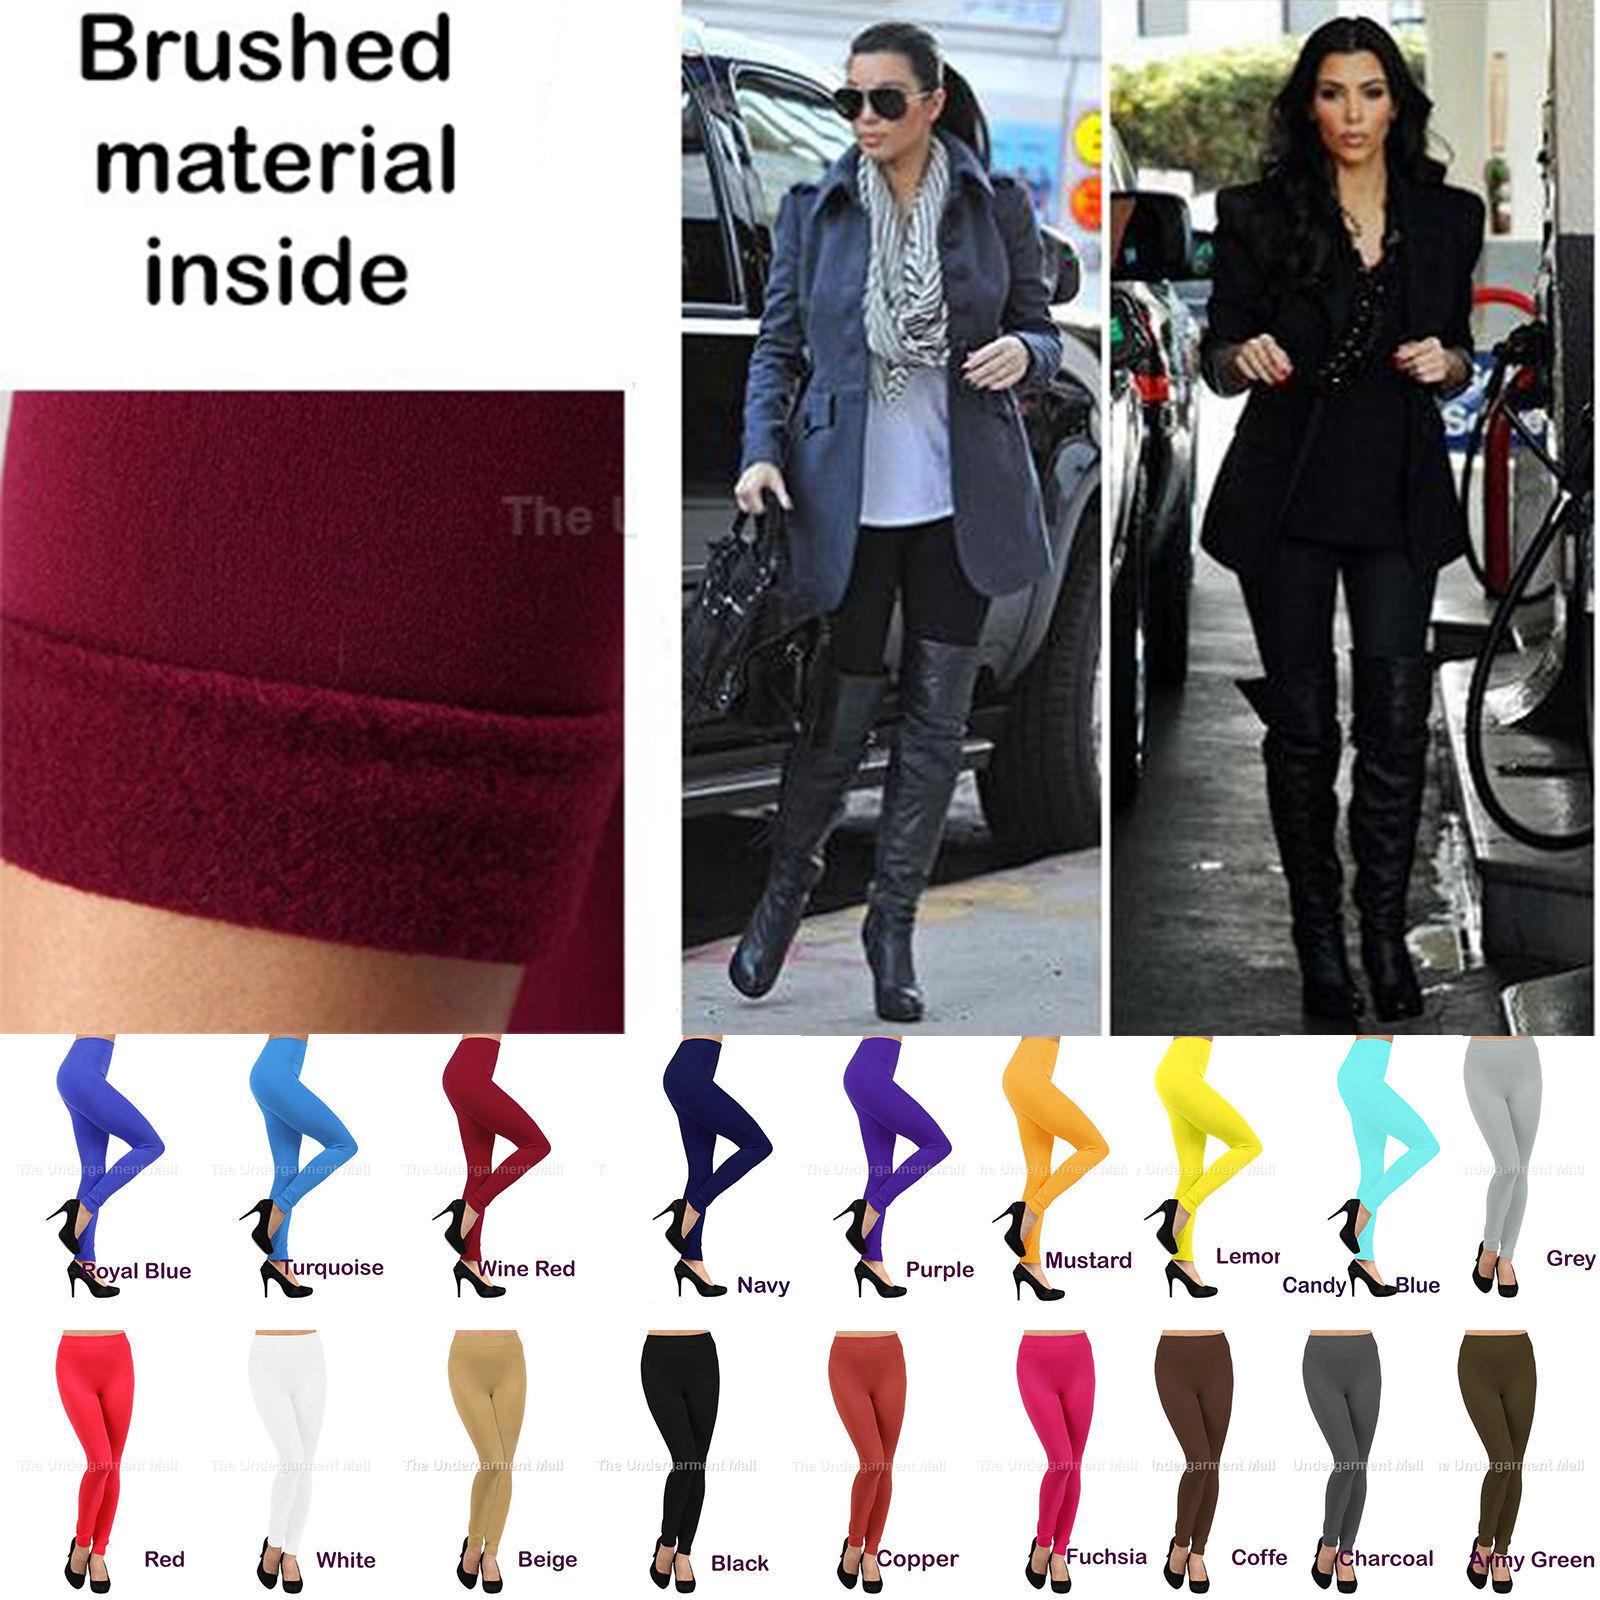 Leggings - Womens Fleece Lined Leggings Thick Warm Winter Stretch Pants New Size XS-XXXL